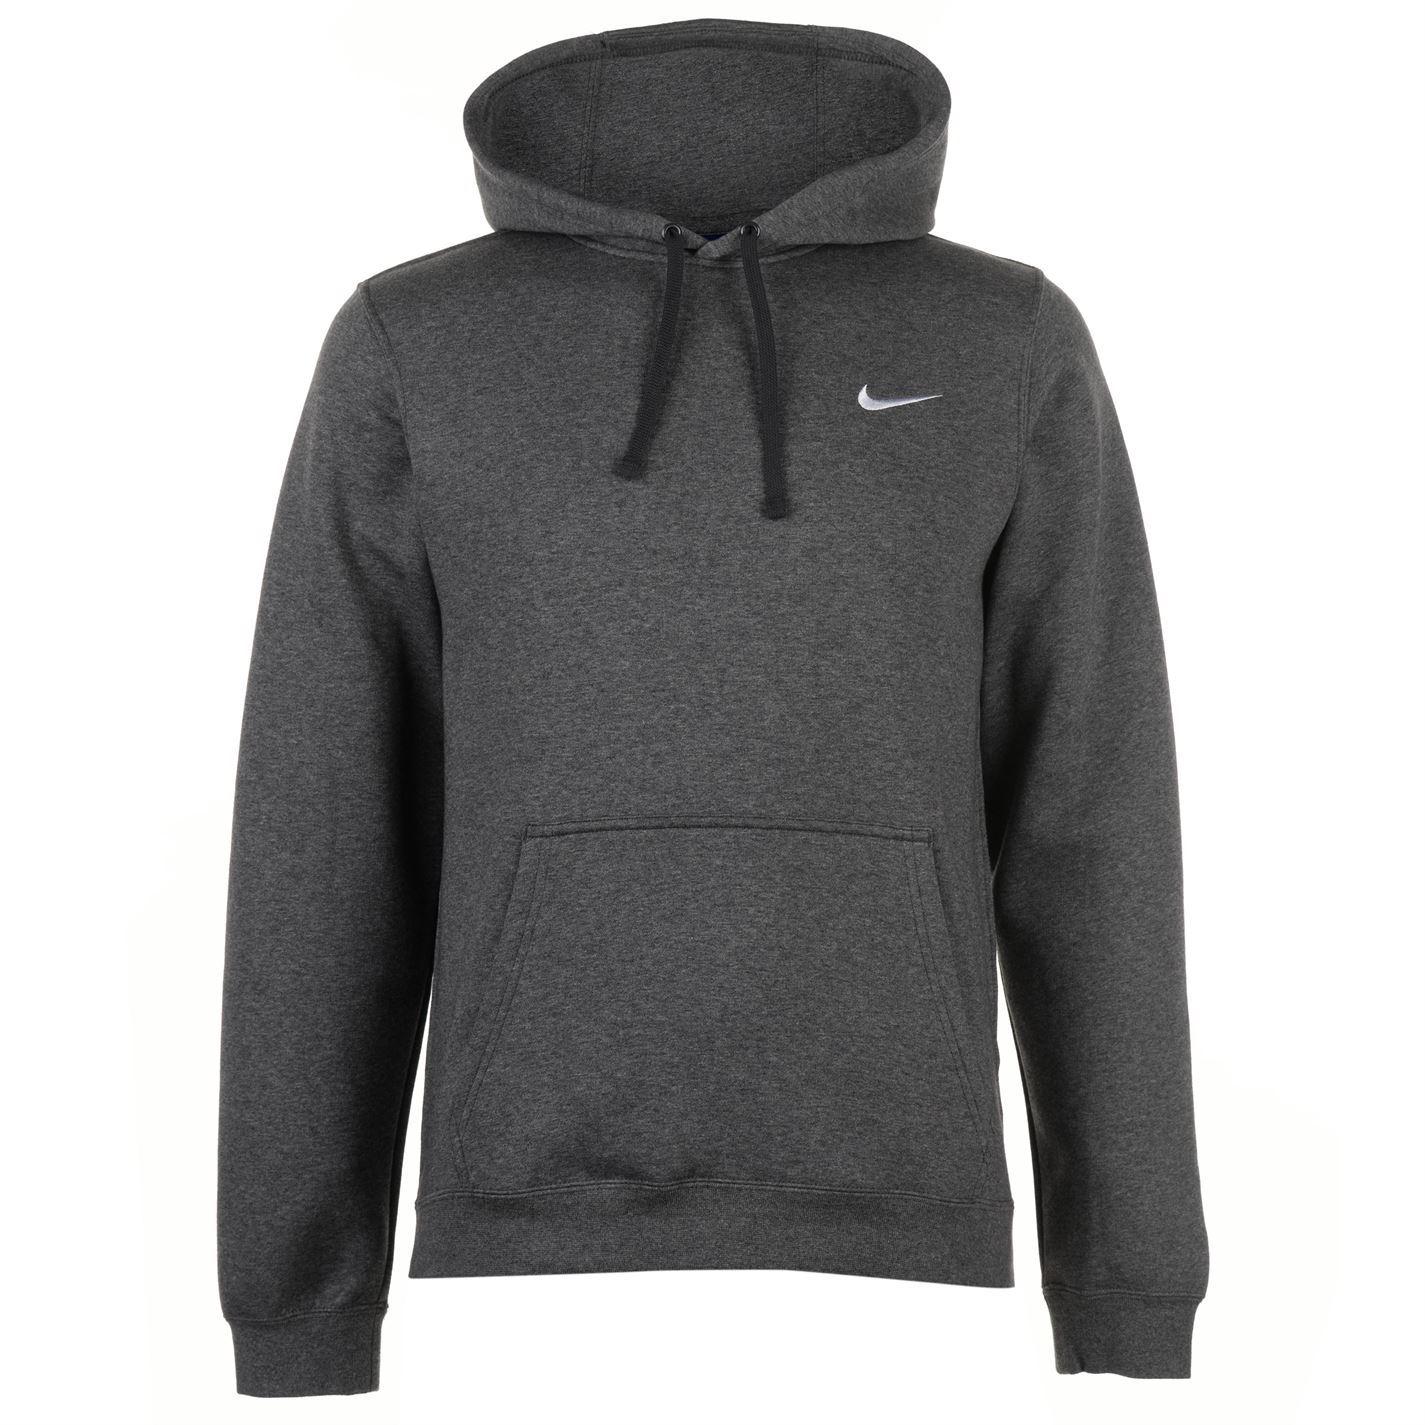 Nike-Fundamentals-Fleece-Lined-Pullover-Hoody-Mens-OTH-Hoodie-Sweatshirt-Sweater thumbnail 15